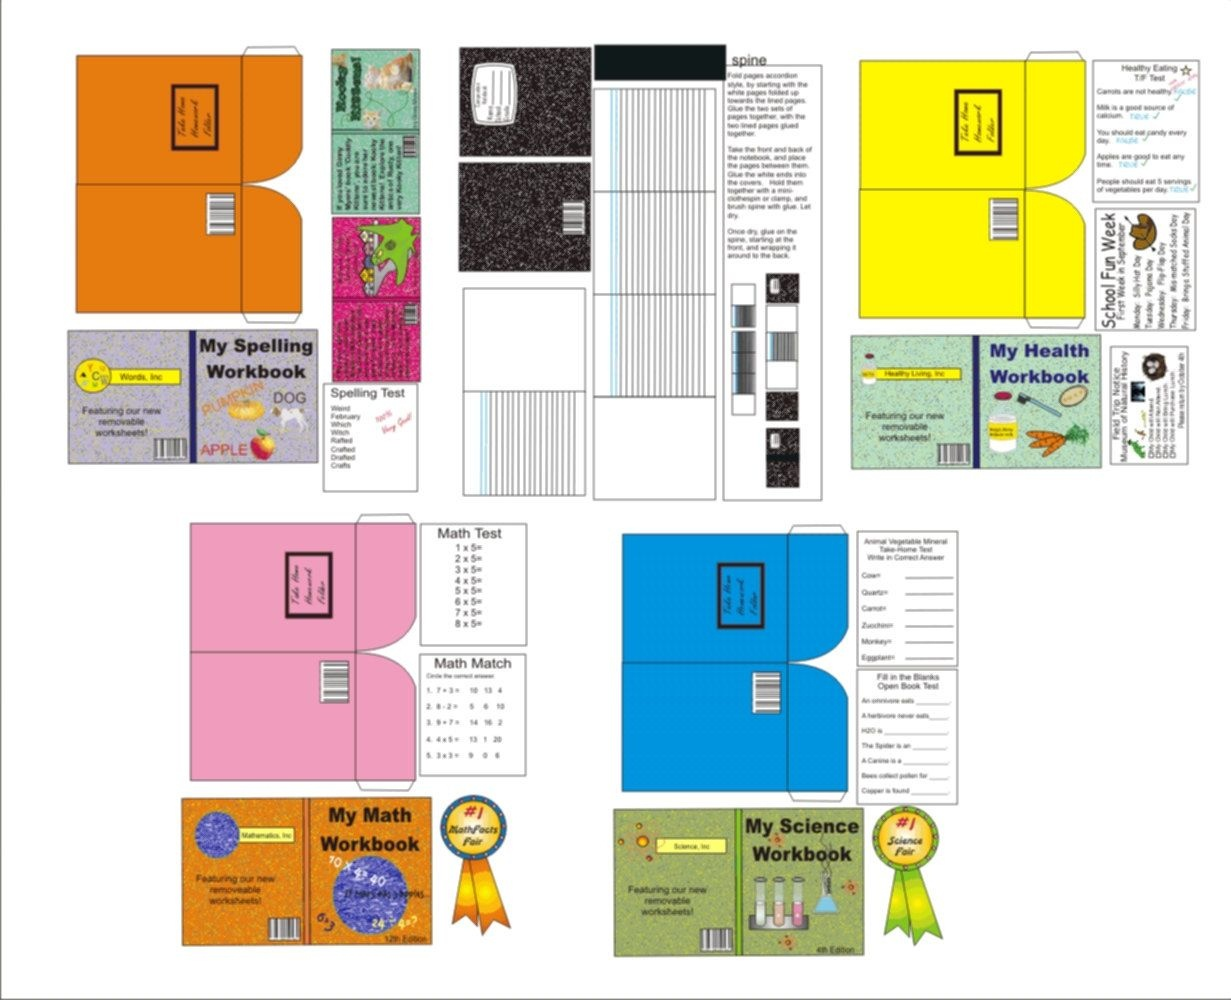 Ag+Doll+Printables+School+Supplies | Like This Item? | Diys - Myfroggystuff Blogspot Free Printables